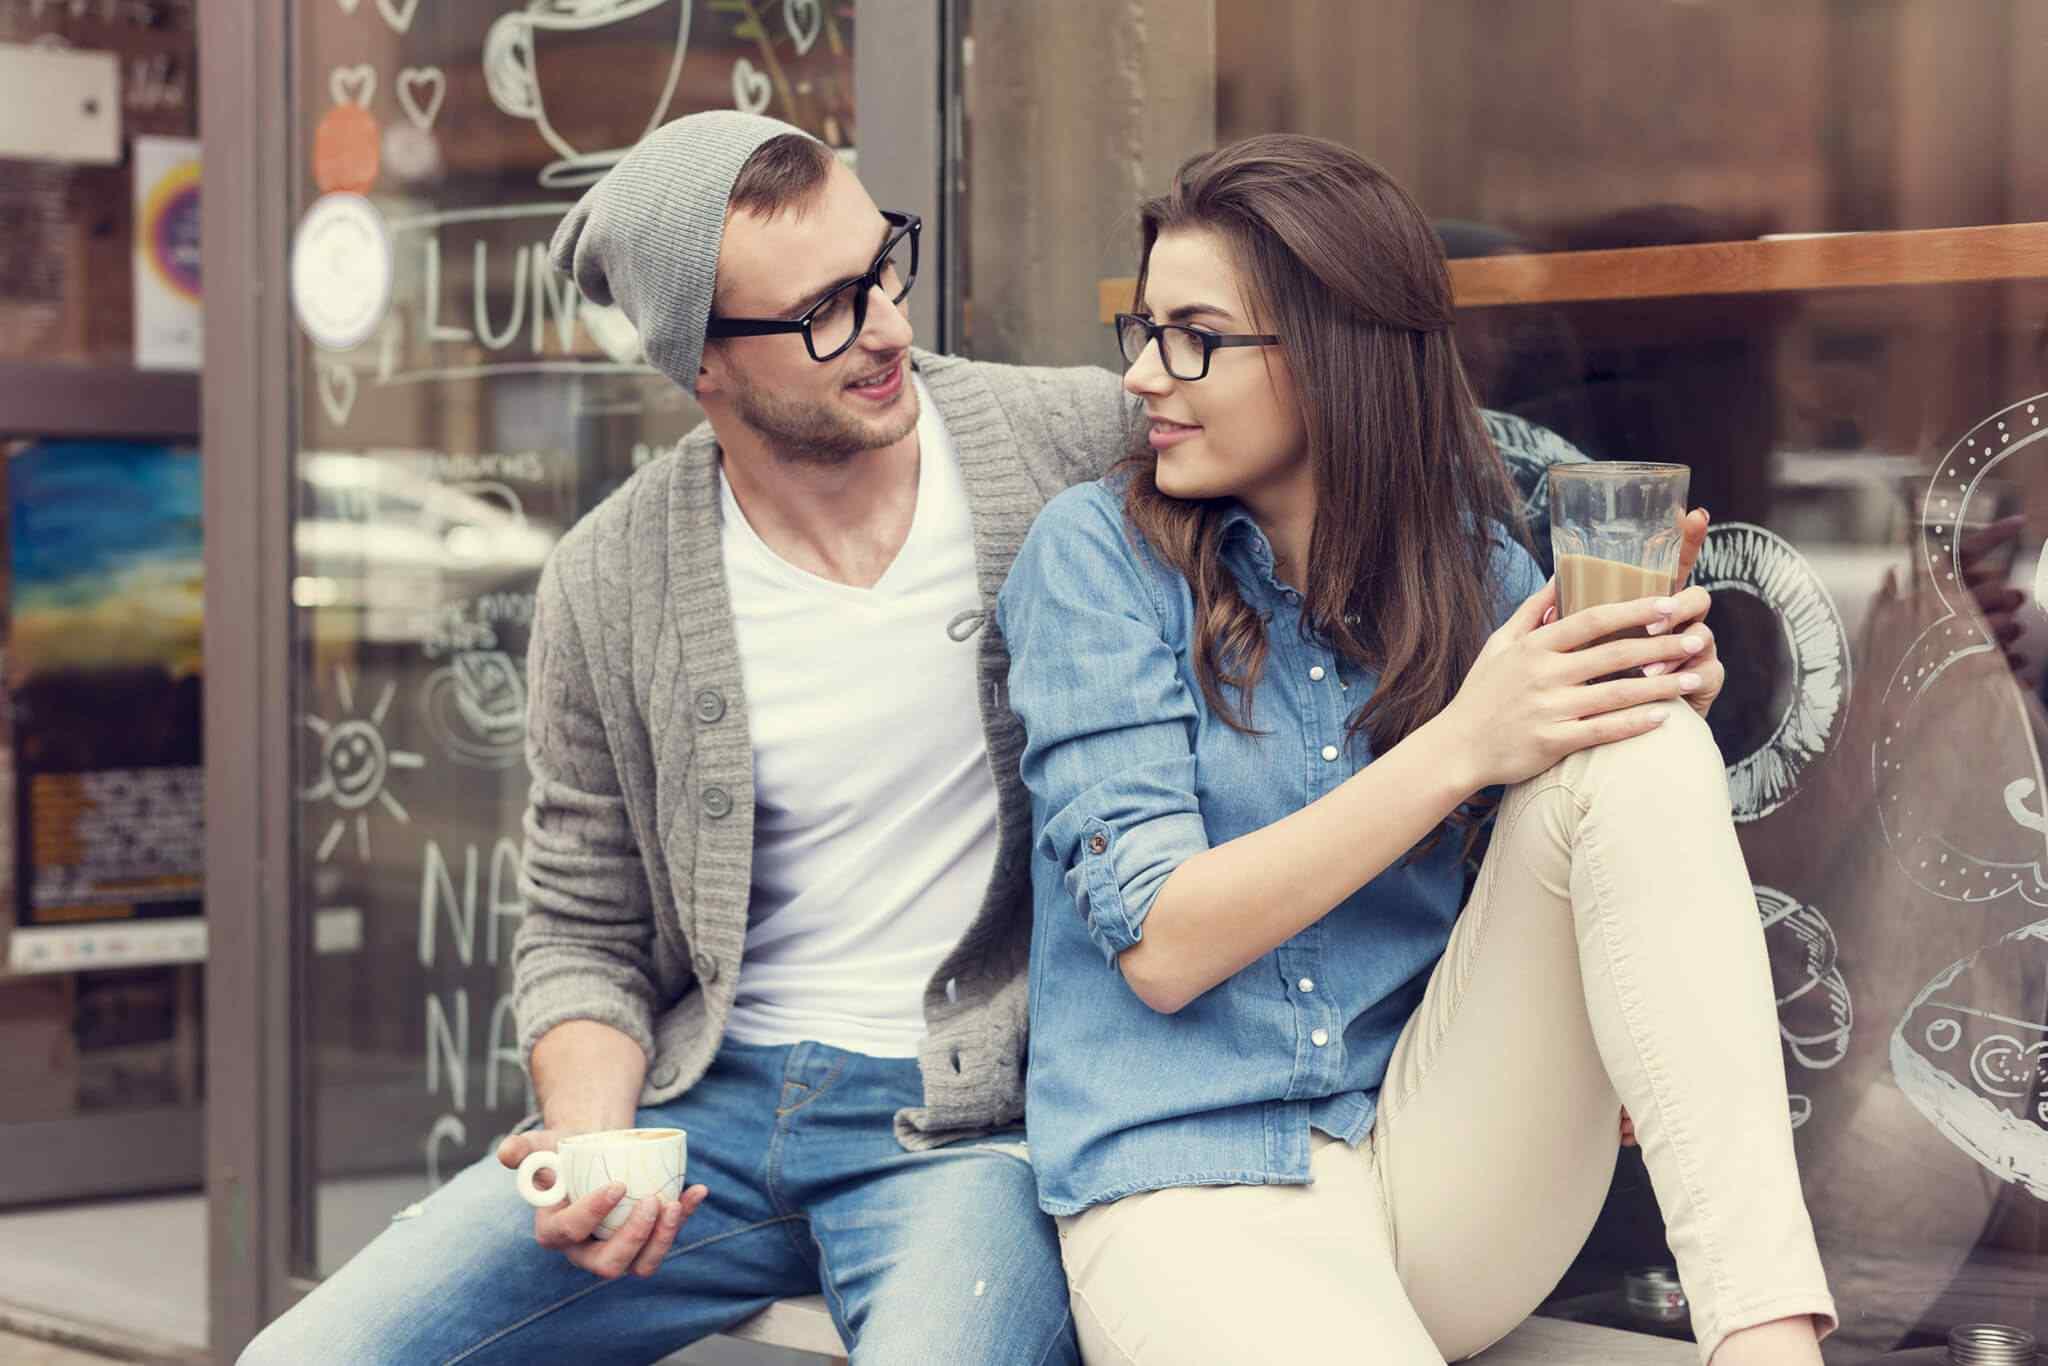 https://www.spiritcoaching.ca/wp-content/uploads/2018/01/img-class-marriage-02.jpg